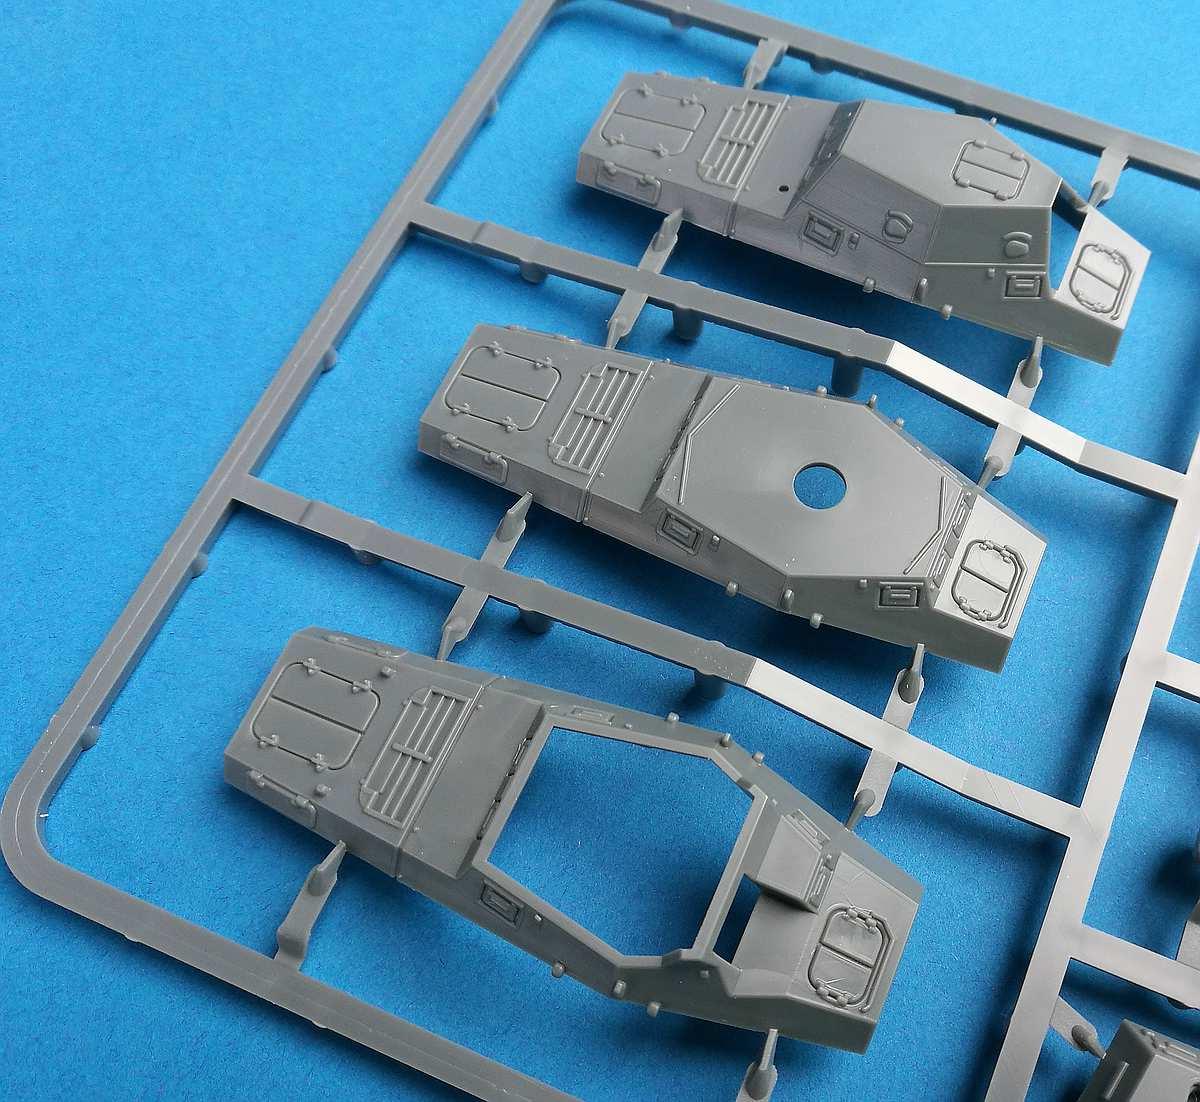 PlasticSoldierCompany-WW2V20025-Sd.Kfz_.-231-Achtrad-Spähwagen-1 Sd.Kfz. 231 8-Rad Spähwagen von Plastic Soldier Company im Maßstab 1:72